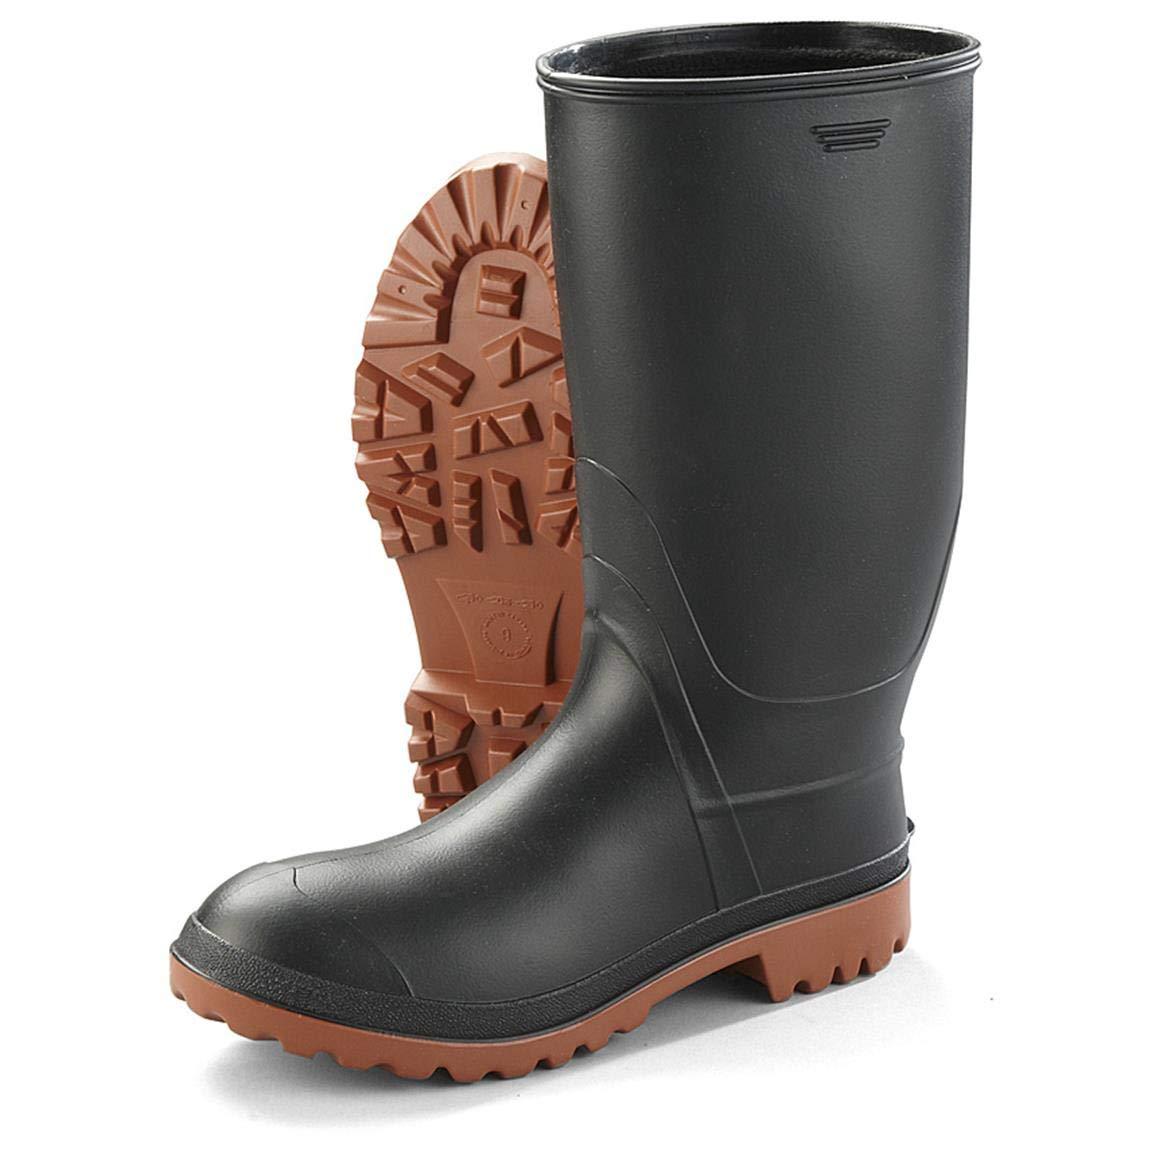 63742aec0d3 Kamik Men's Ranger Rubber Boots